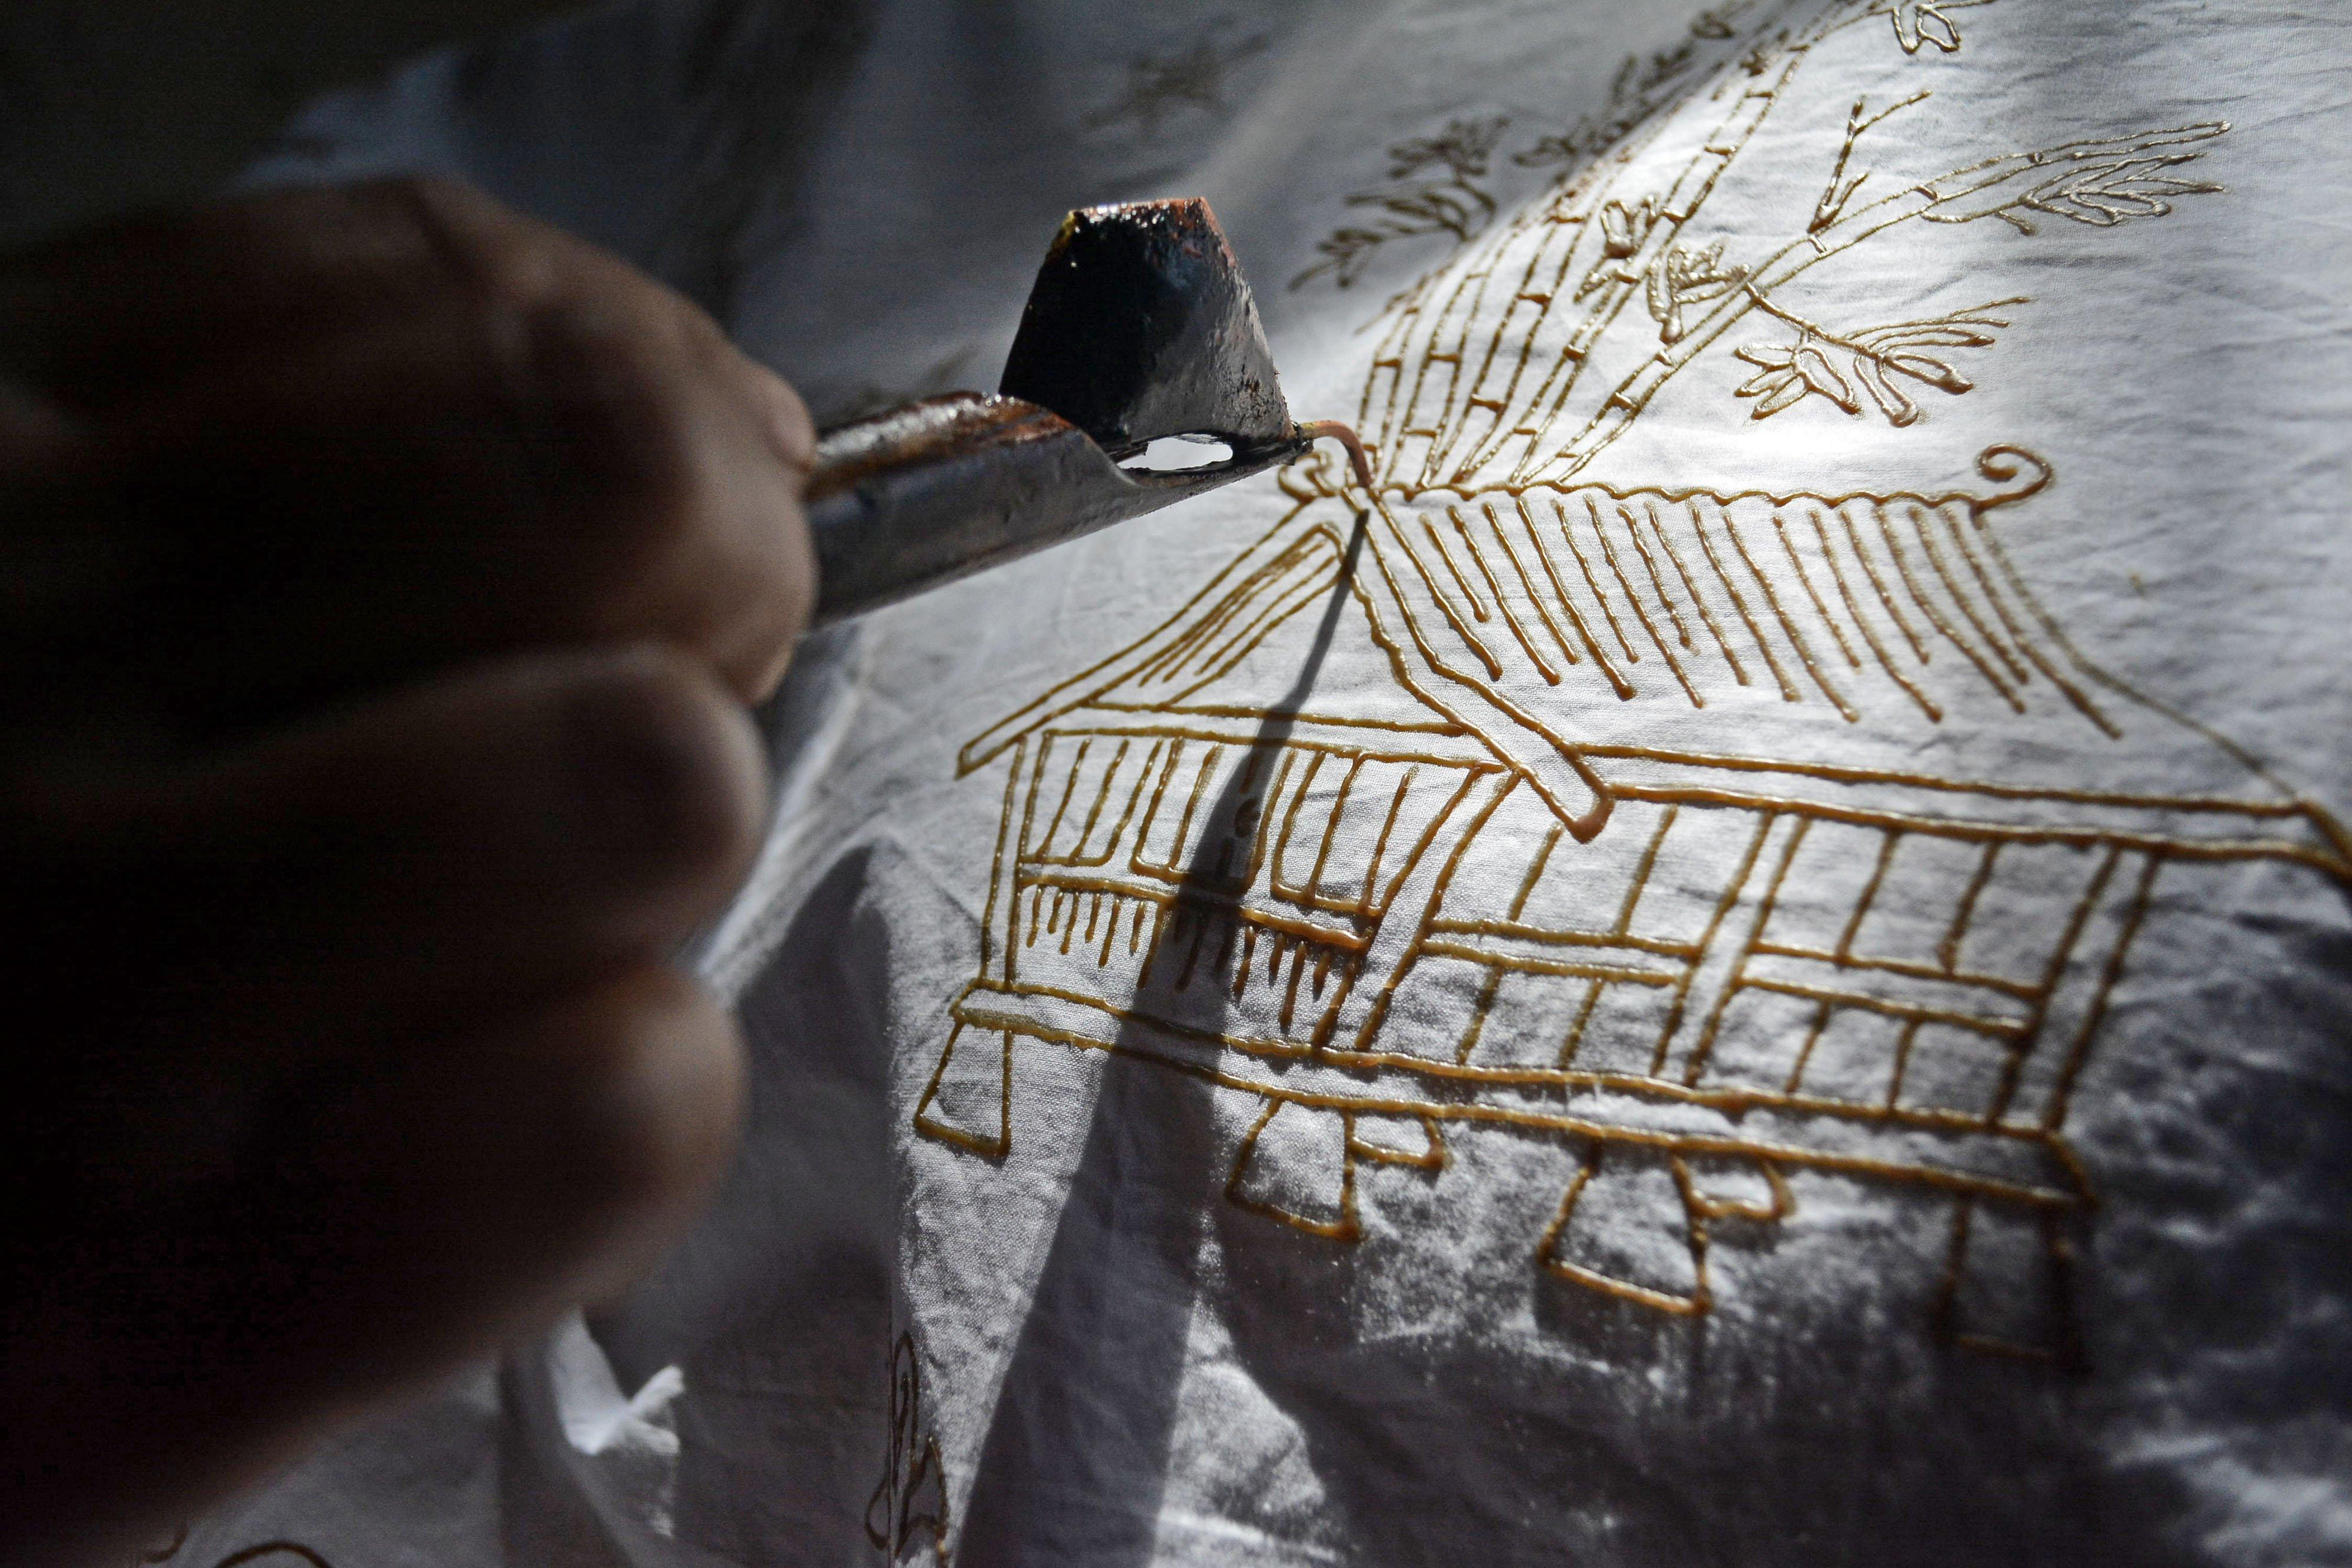 Perajin menyelesaikan pembuatan batik tulis pasiran motif Leuit Pare di Samarang, Kabupaten Garut, Jawa Barat, Kamis (15/10/2020). Perajin kelompok batik Nirmala tersebut mempunyai ciri khas motif batik tulis seperti Leuit Pare, Mayang Kahuripan, Sampeu Antanan, dan Kembang Katresna yang dijual Rp.1 juta hingga Rp.1,5 juta tergantung tingkat kesulitan. ANTARA FOTO/Candra Yanuarsyah/agr/hp.